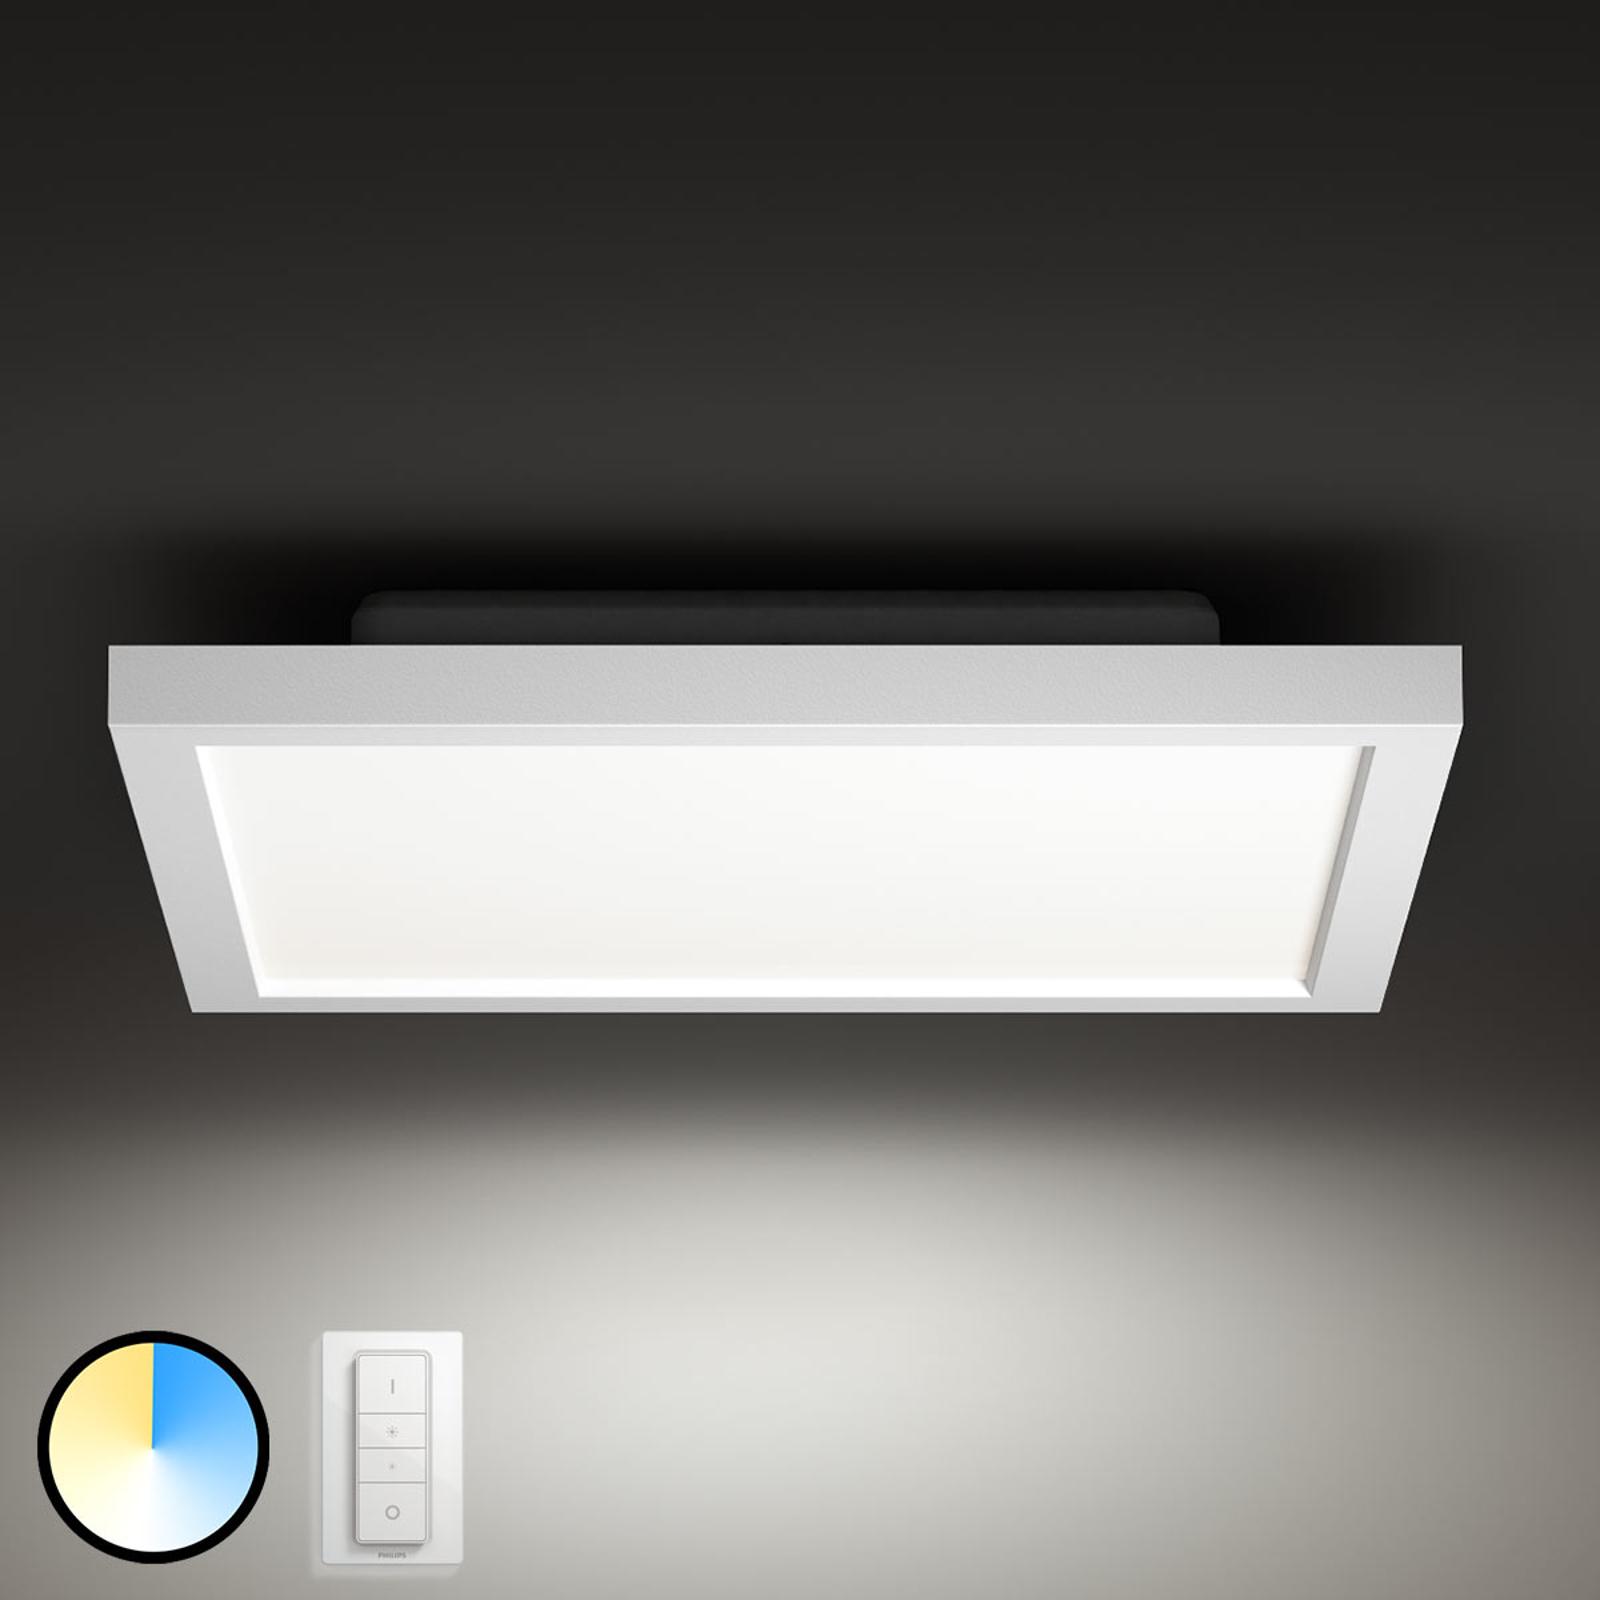 Philips Hue Aurelle panel LED angular, 30 x 30 cm